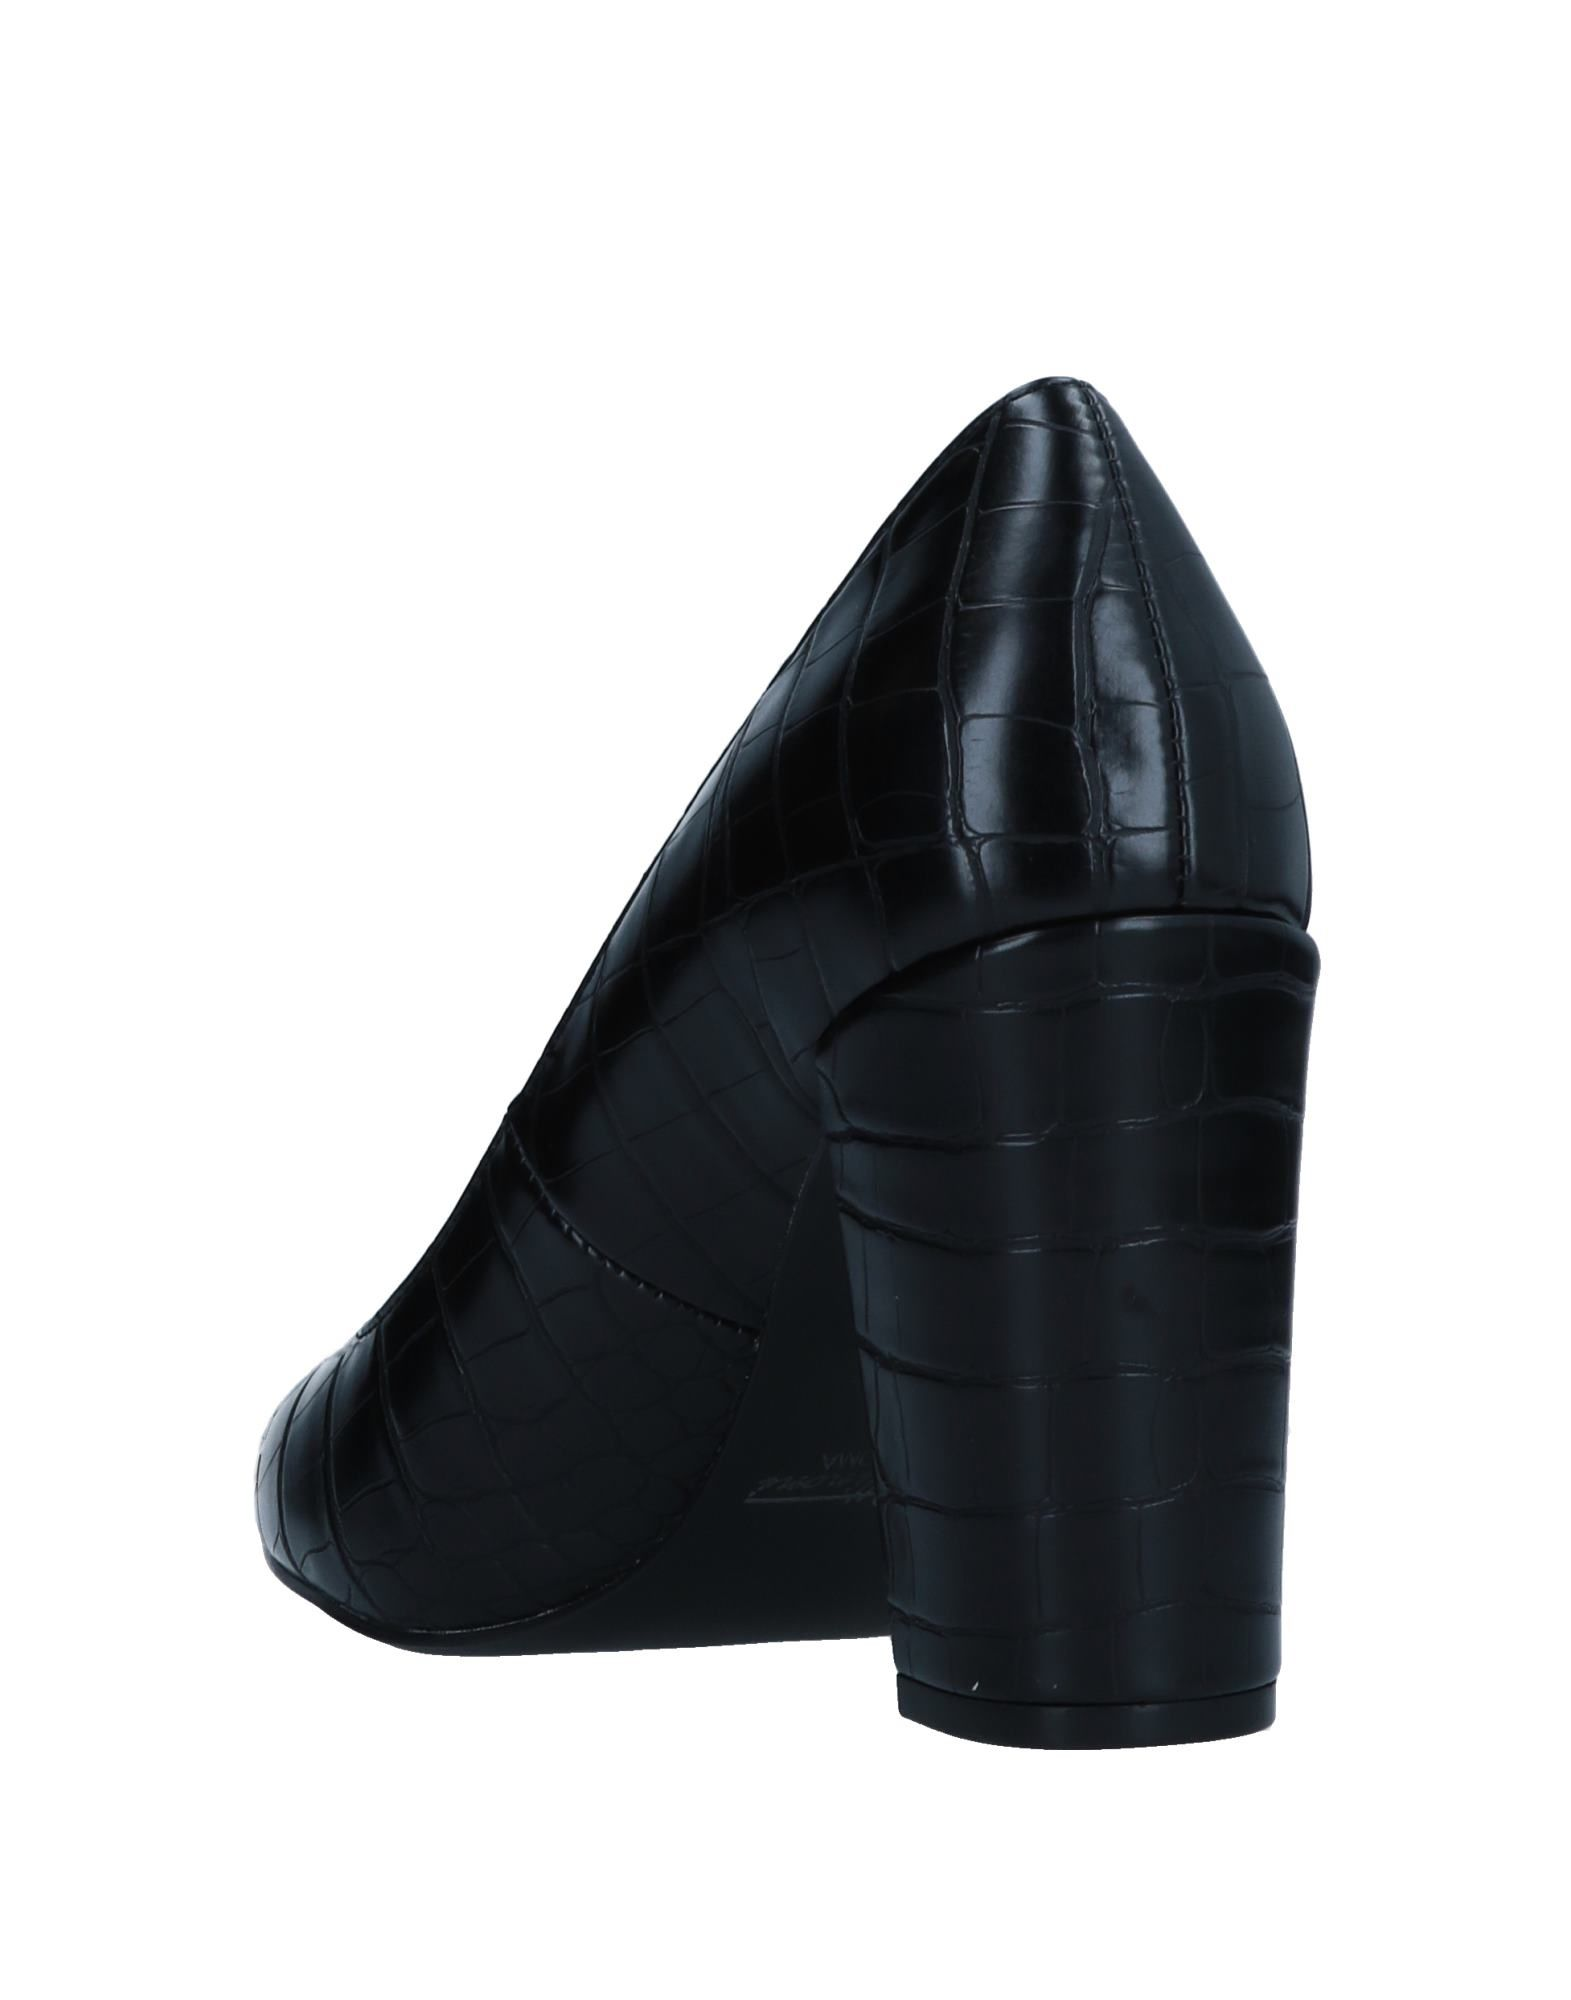 Gattinoni Pumps Damen beliebte  11516985GD Gute Qualität beliebte Damen Schuhe f6952f